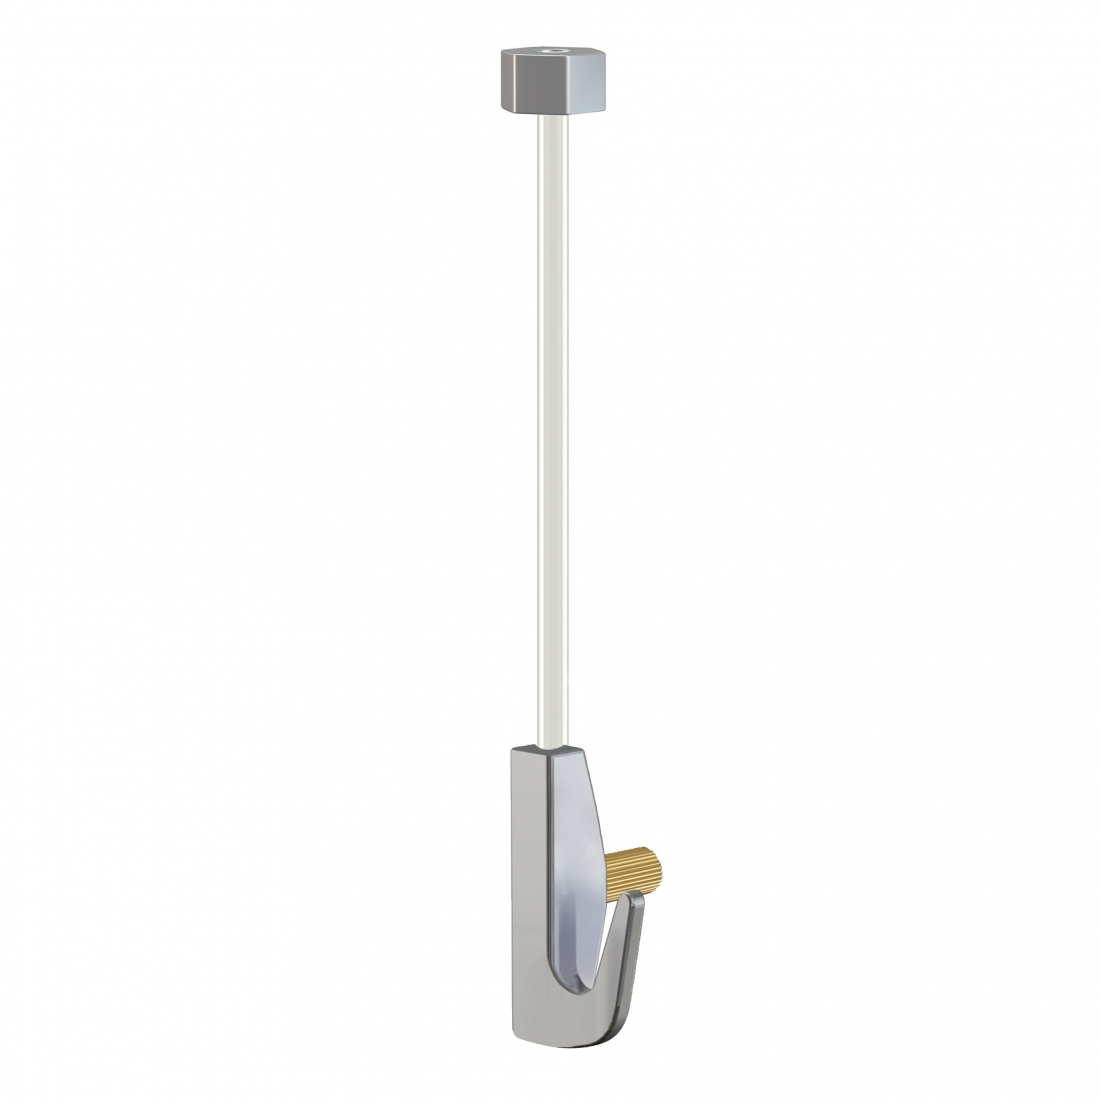 kit de cable de nylon con gancho colgador para guia para colgar cuadros con tope invisible, artiteq 7 kg